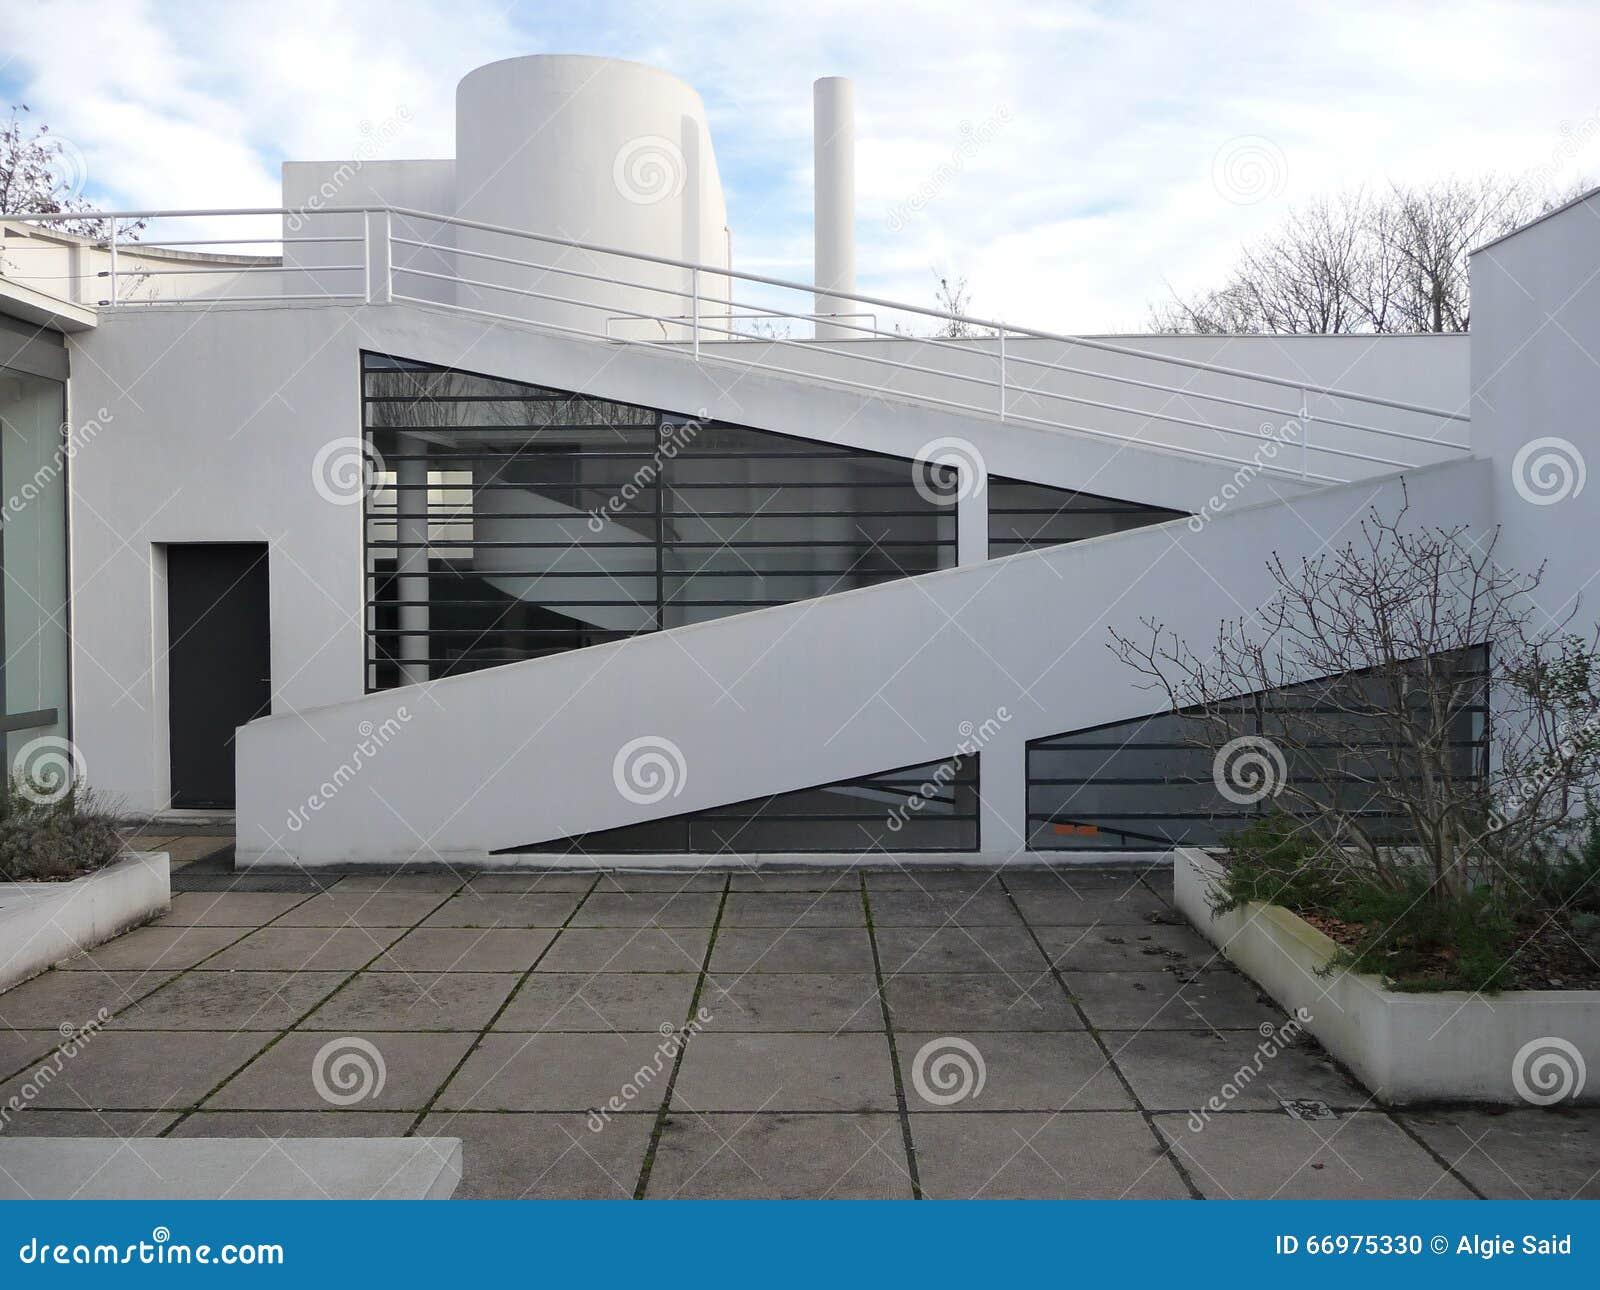 Paris - villa Savoye (takuteplatsen)